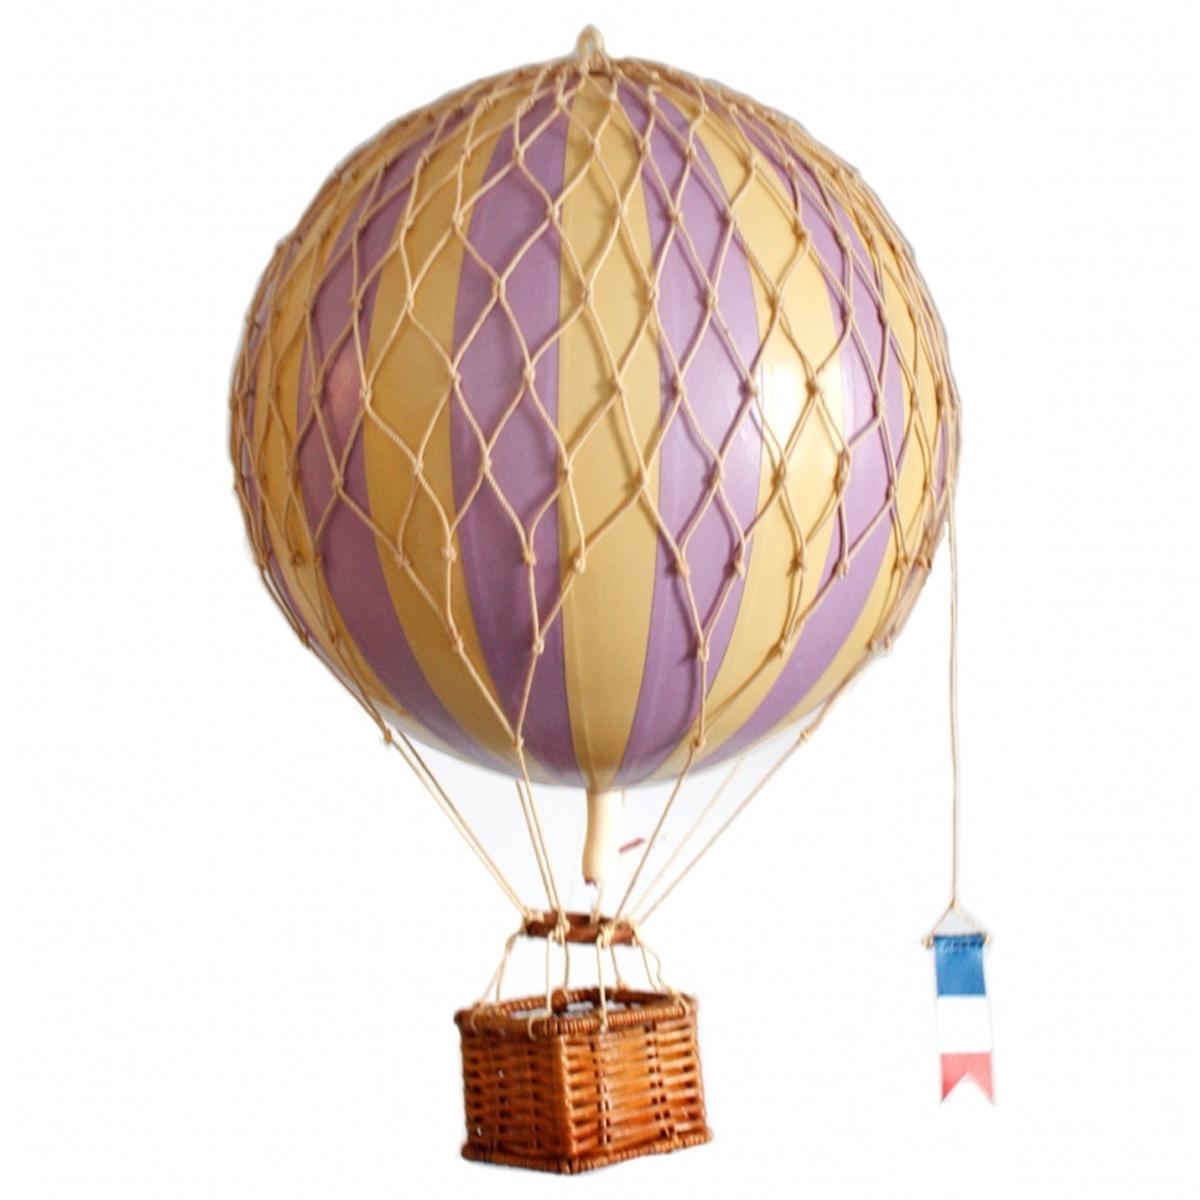 Image of Authentic Models luftballon 32 cm - lavender